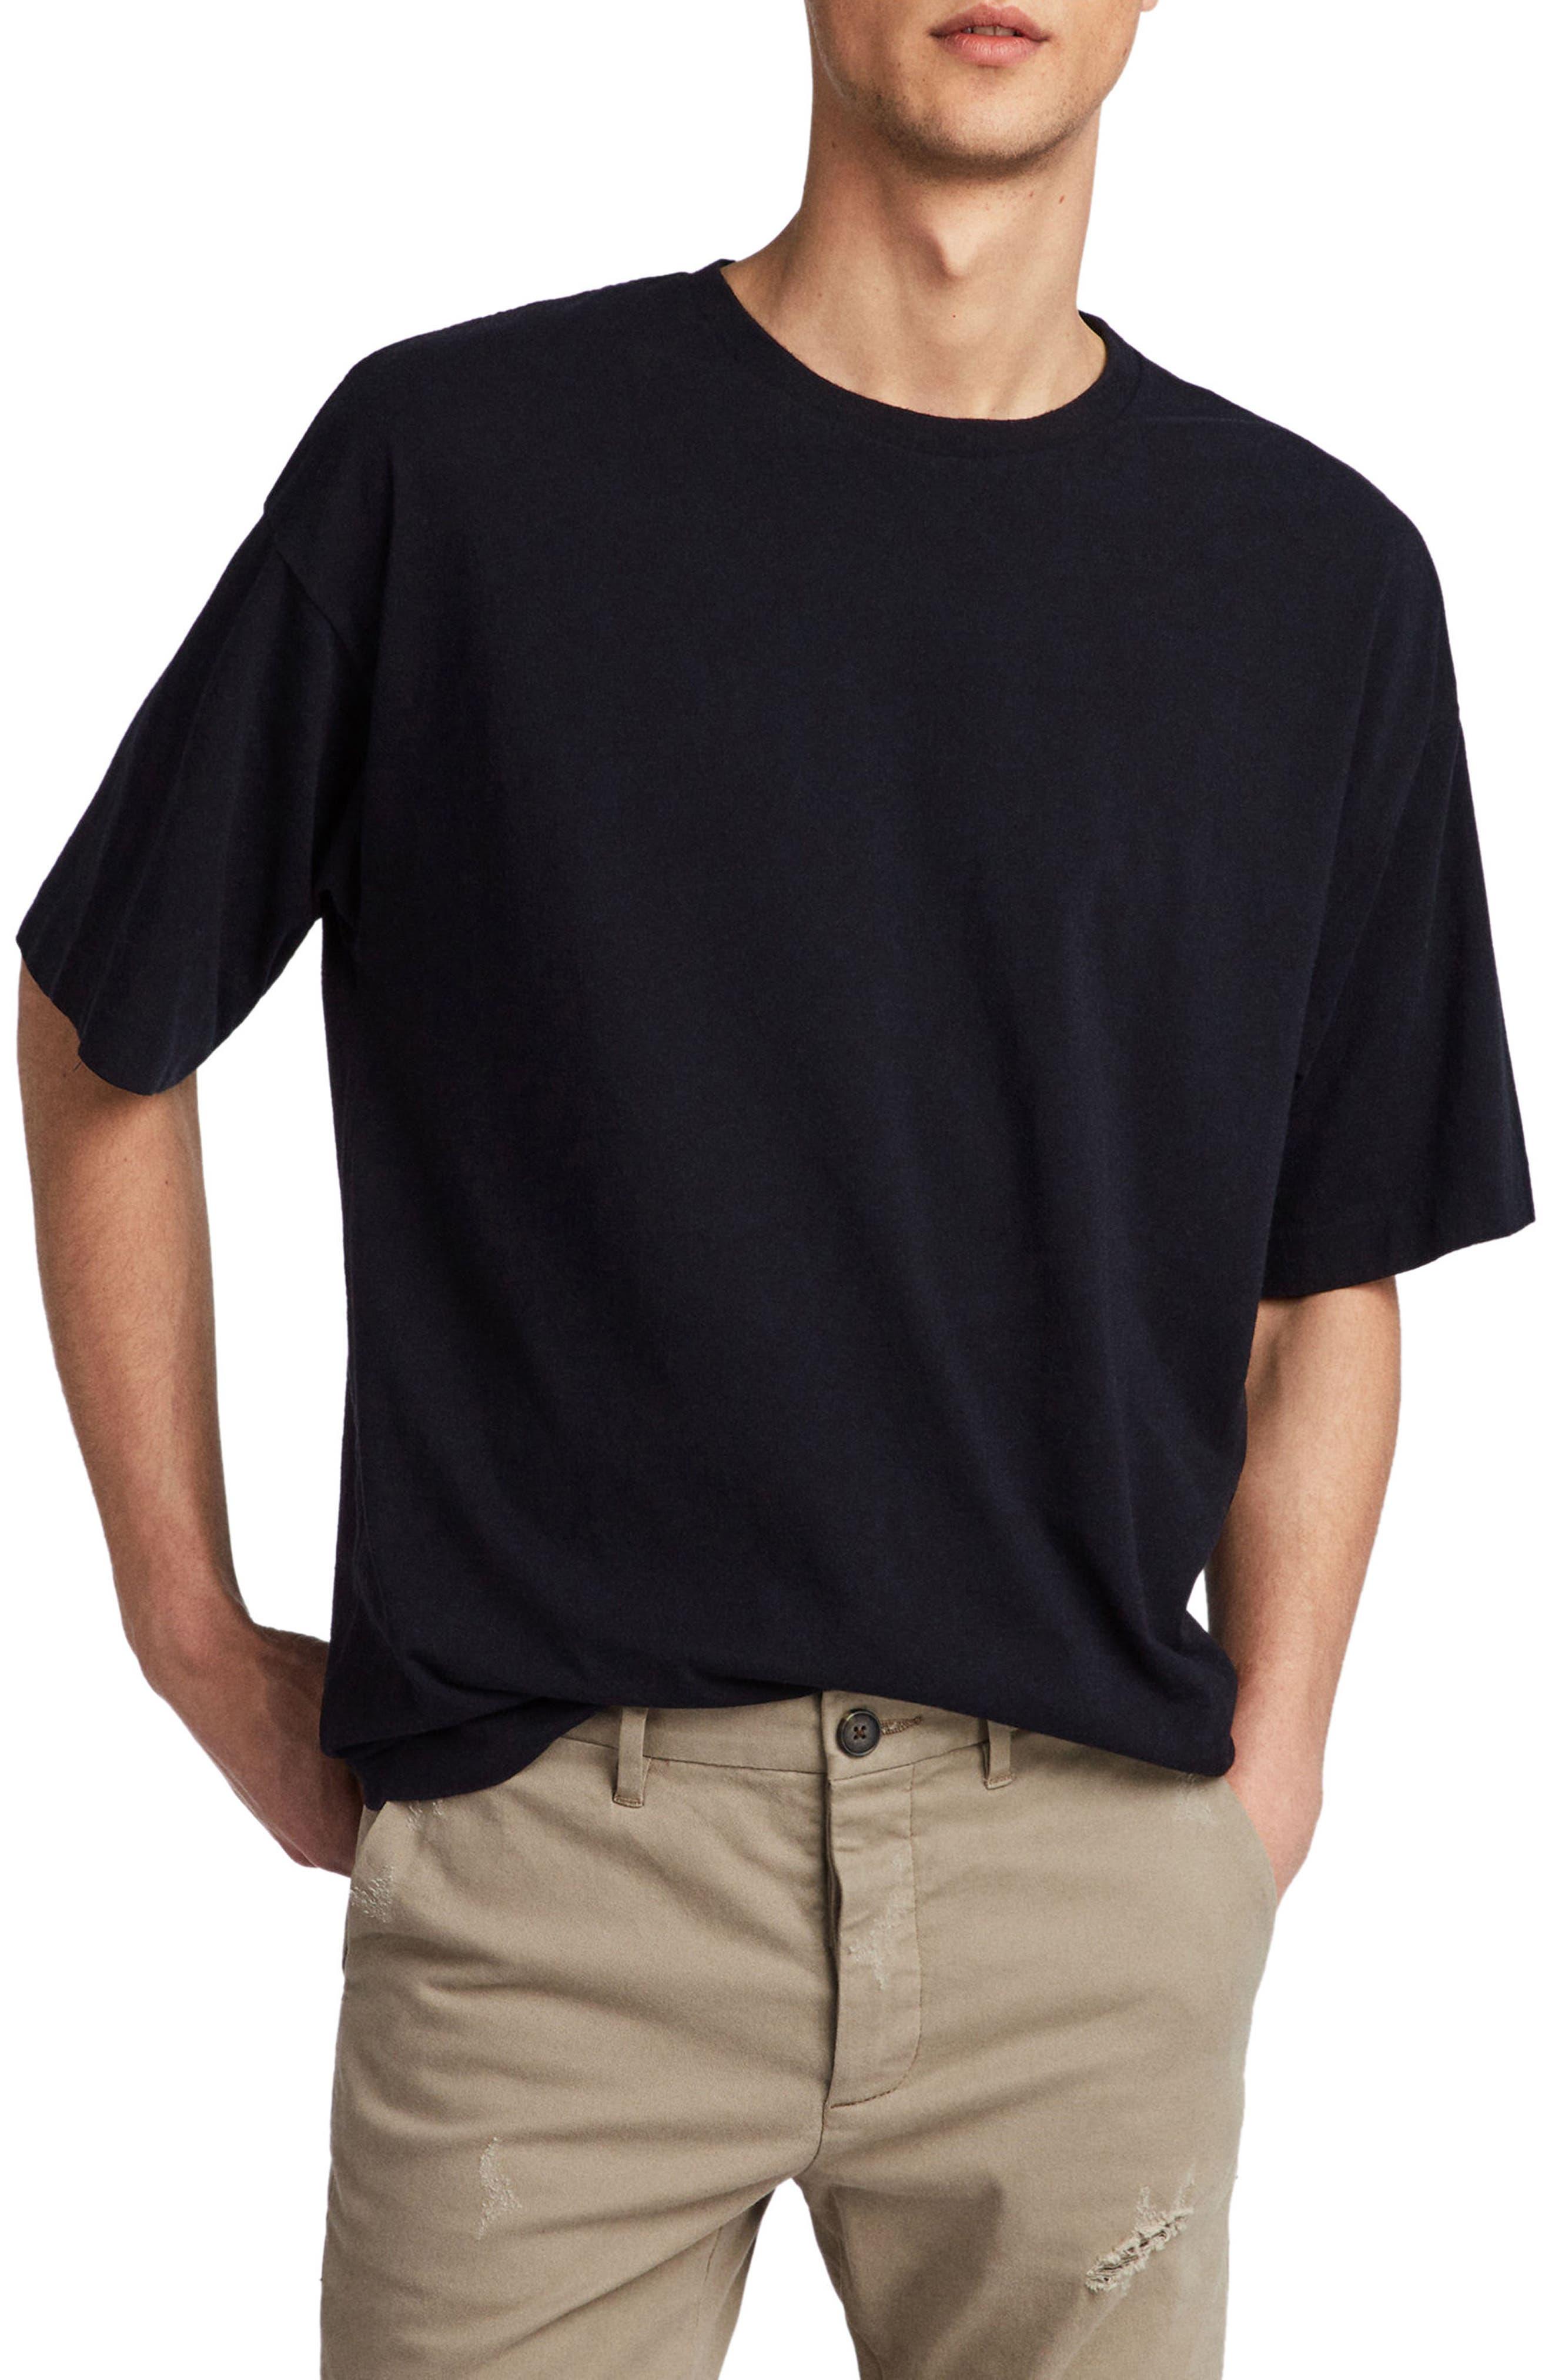 Atnom Crewneck T-Shirt,                         Main,                         color, JET BLACK